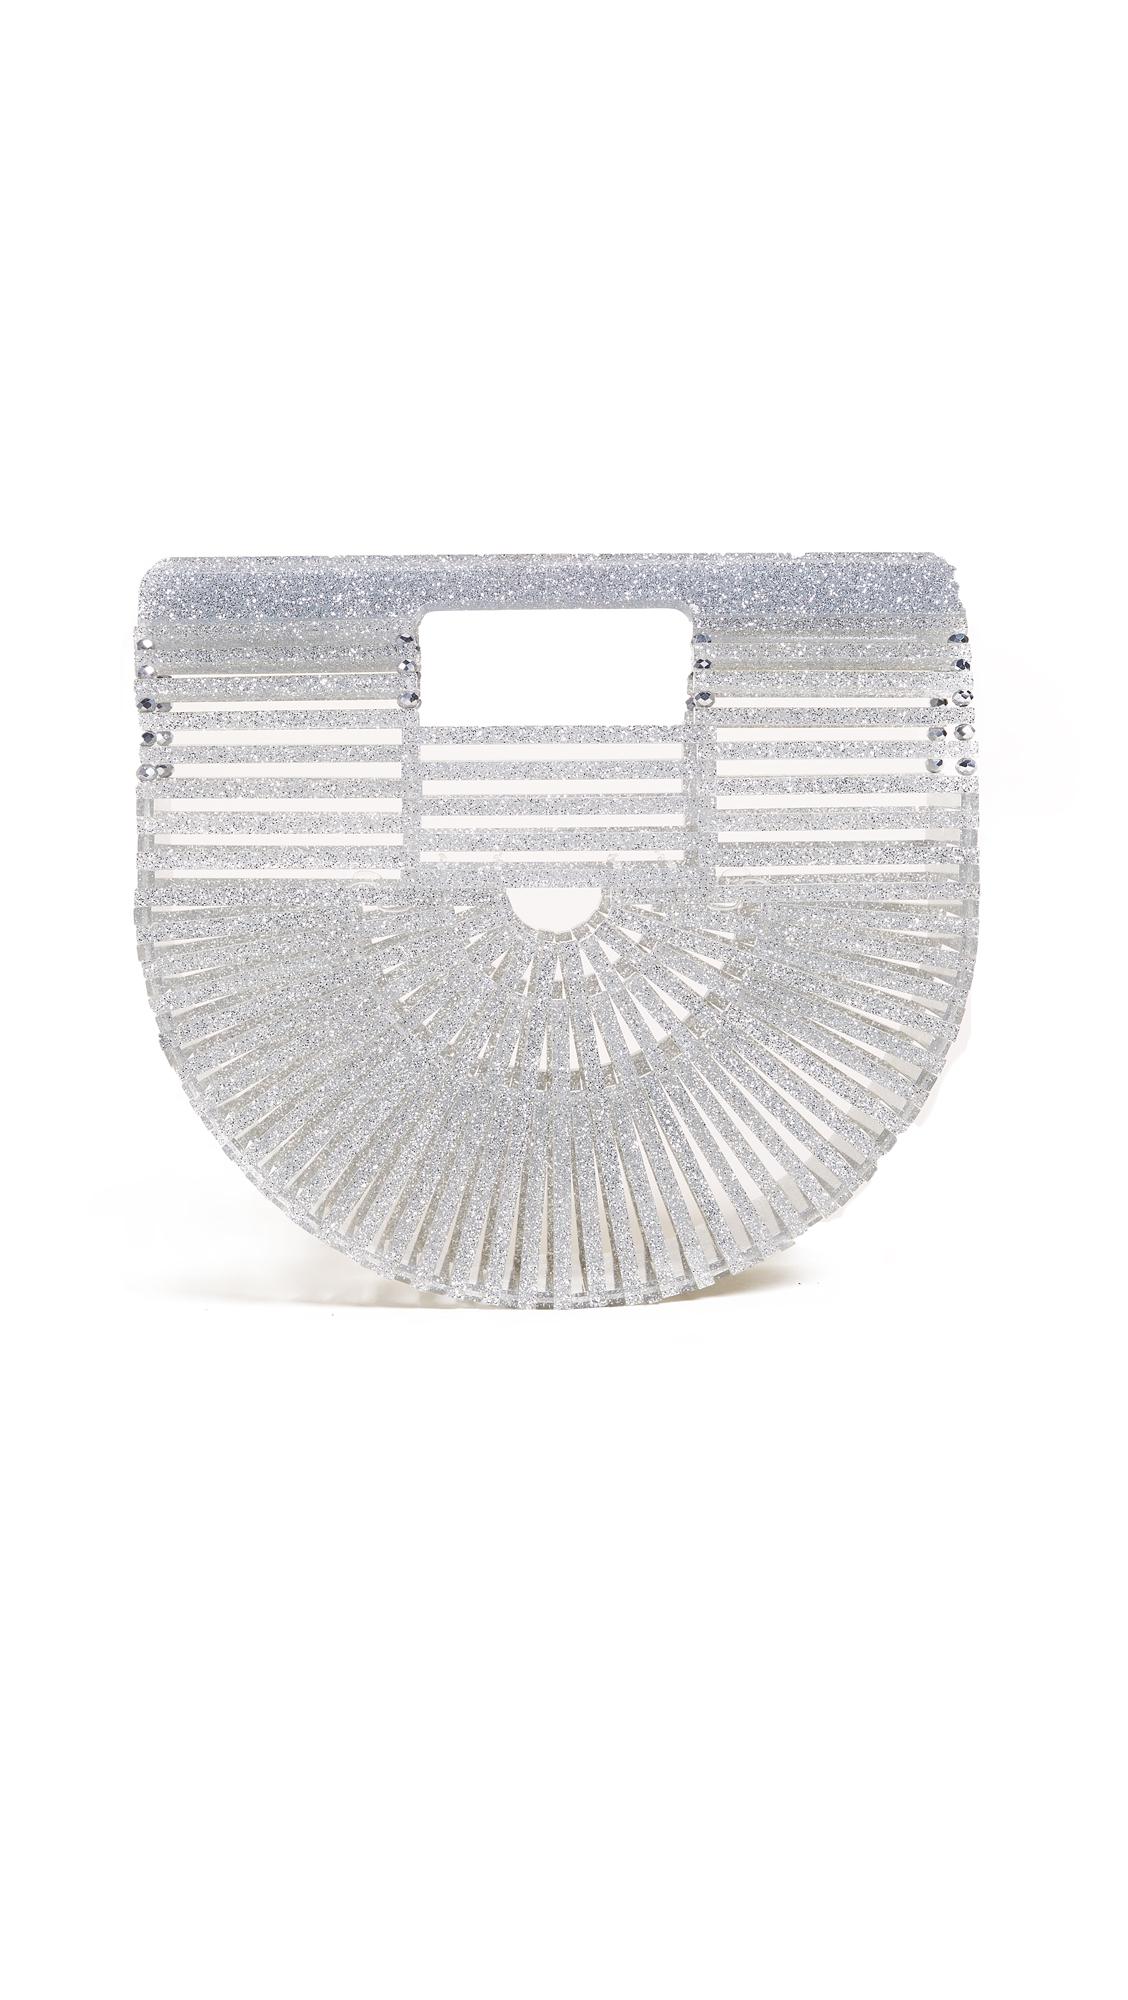 Cult Gaia Acrylic Ark Mini Bag - Glitter